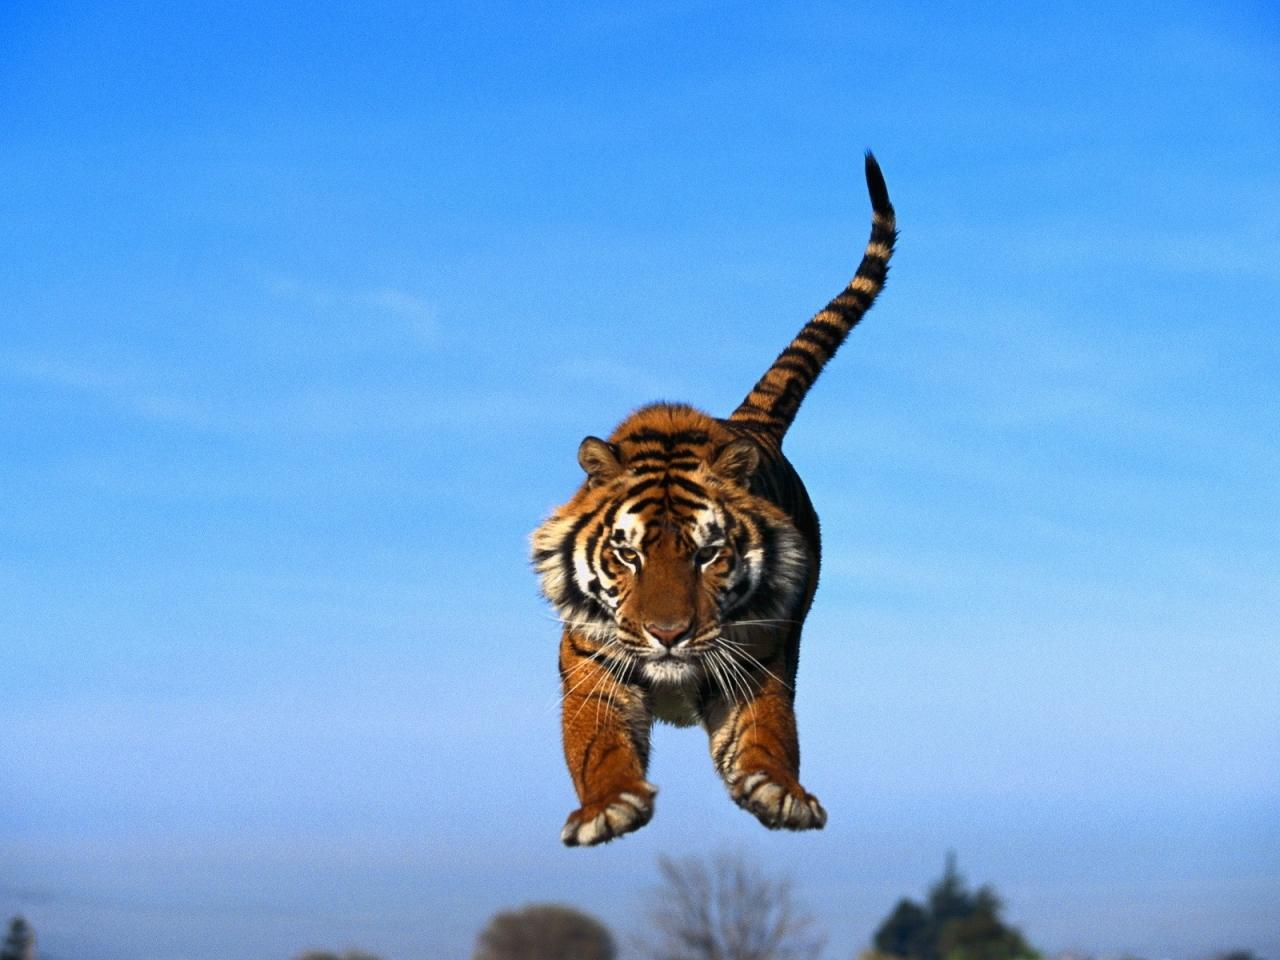 Un tigre saltando - 1280x960